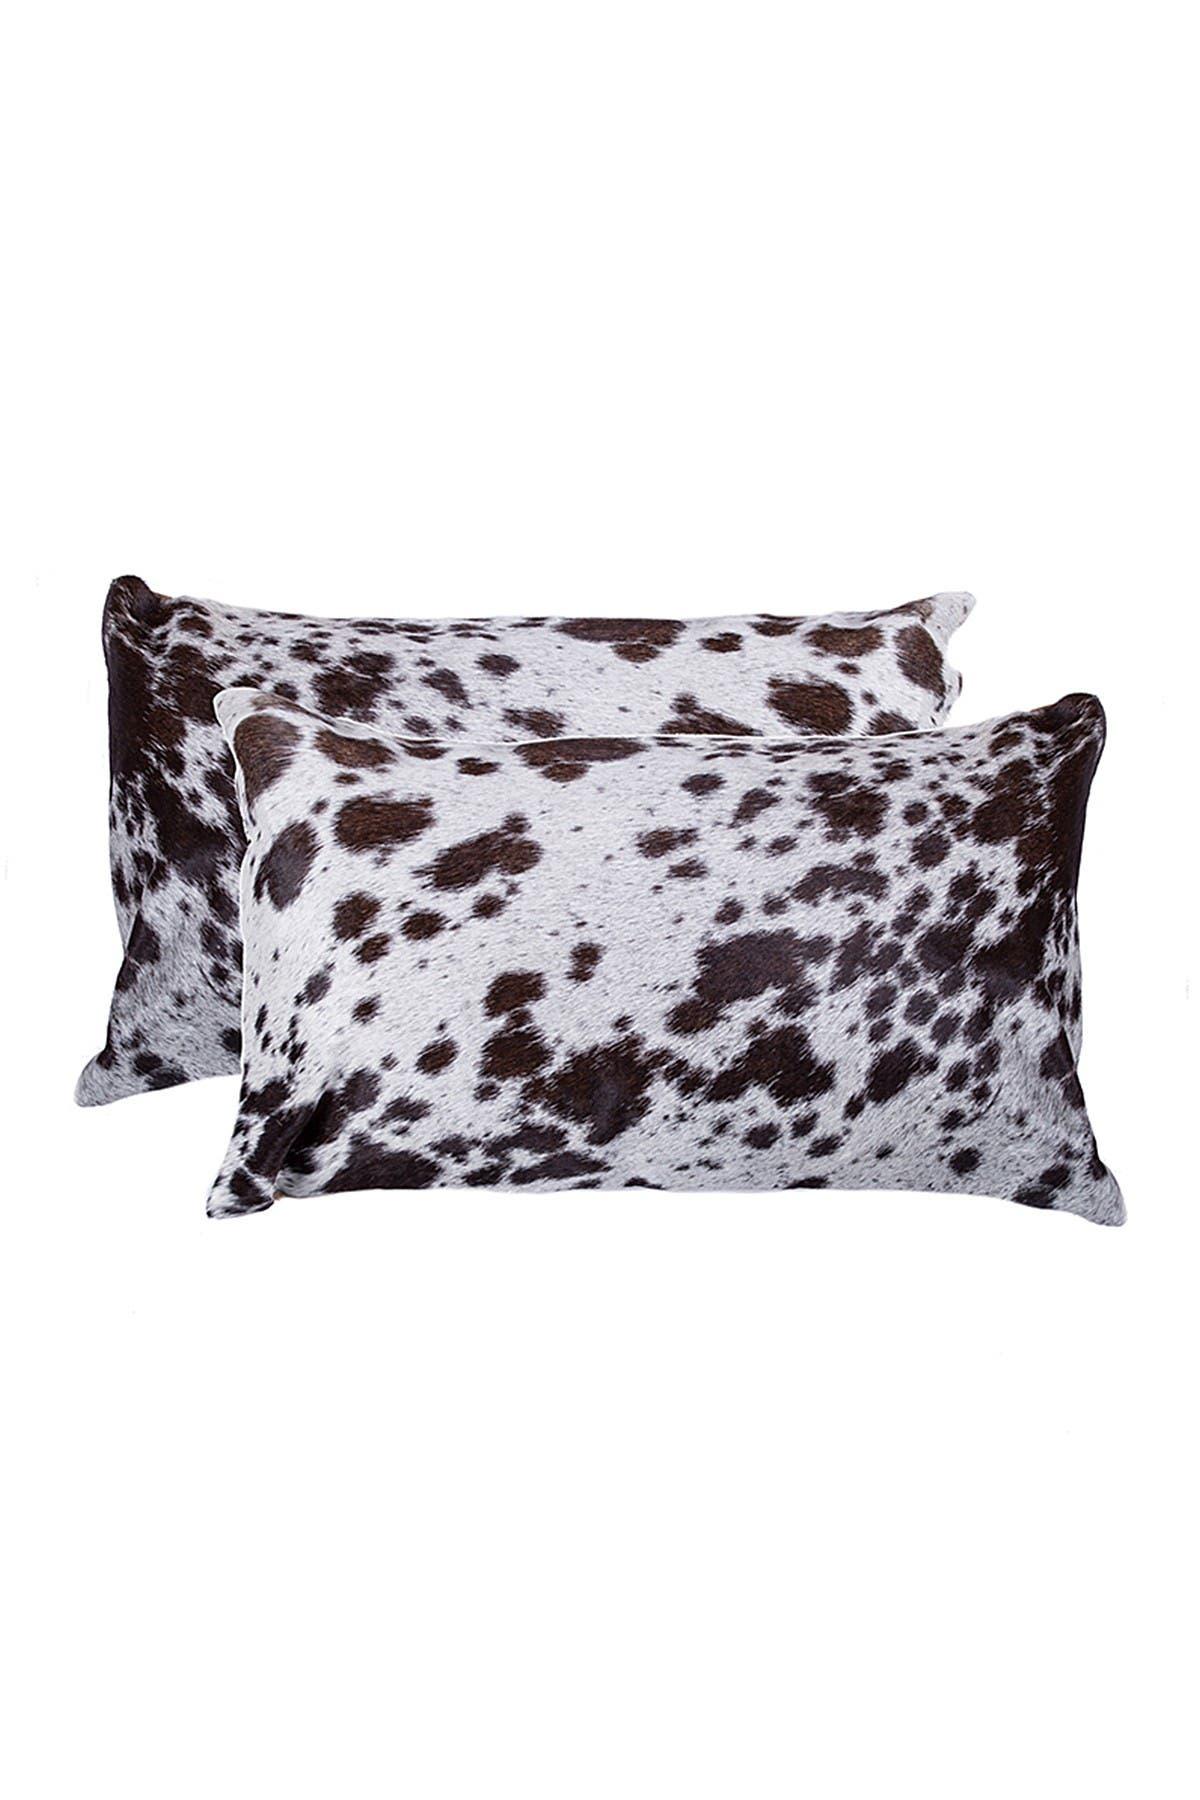 "Image of Natural Torino Kobe Genuine Cowhide Pillow - Set of 2 - 12""x20"" - Chocolate/White"